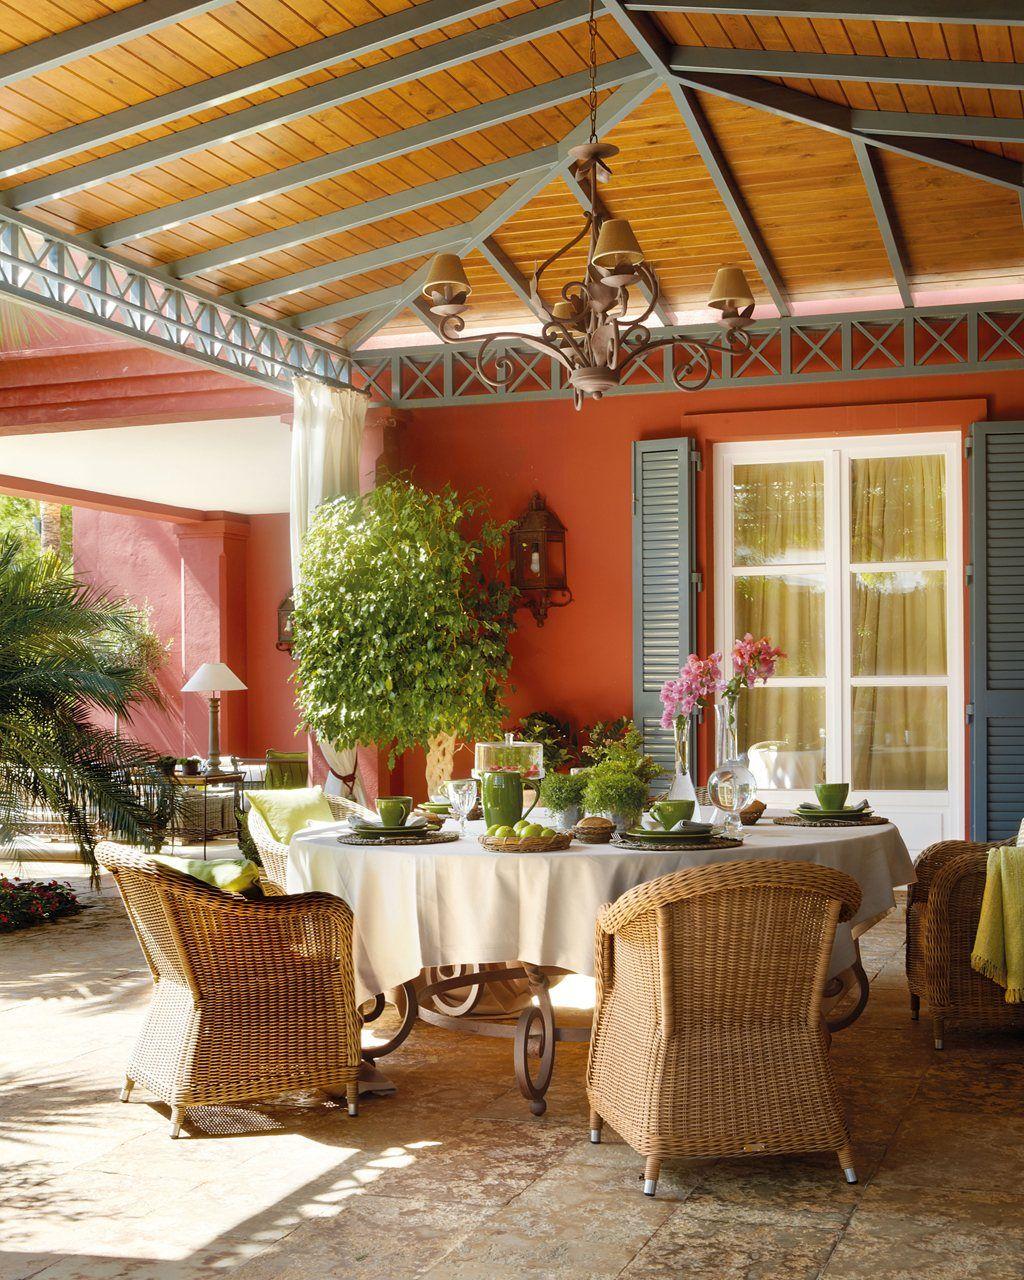 En el porche andaluz comer a la sombra mesa de forja en guadarte paneras de rat n cuberter a - Porches de casas de campo ...